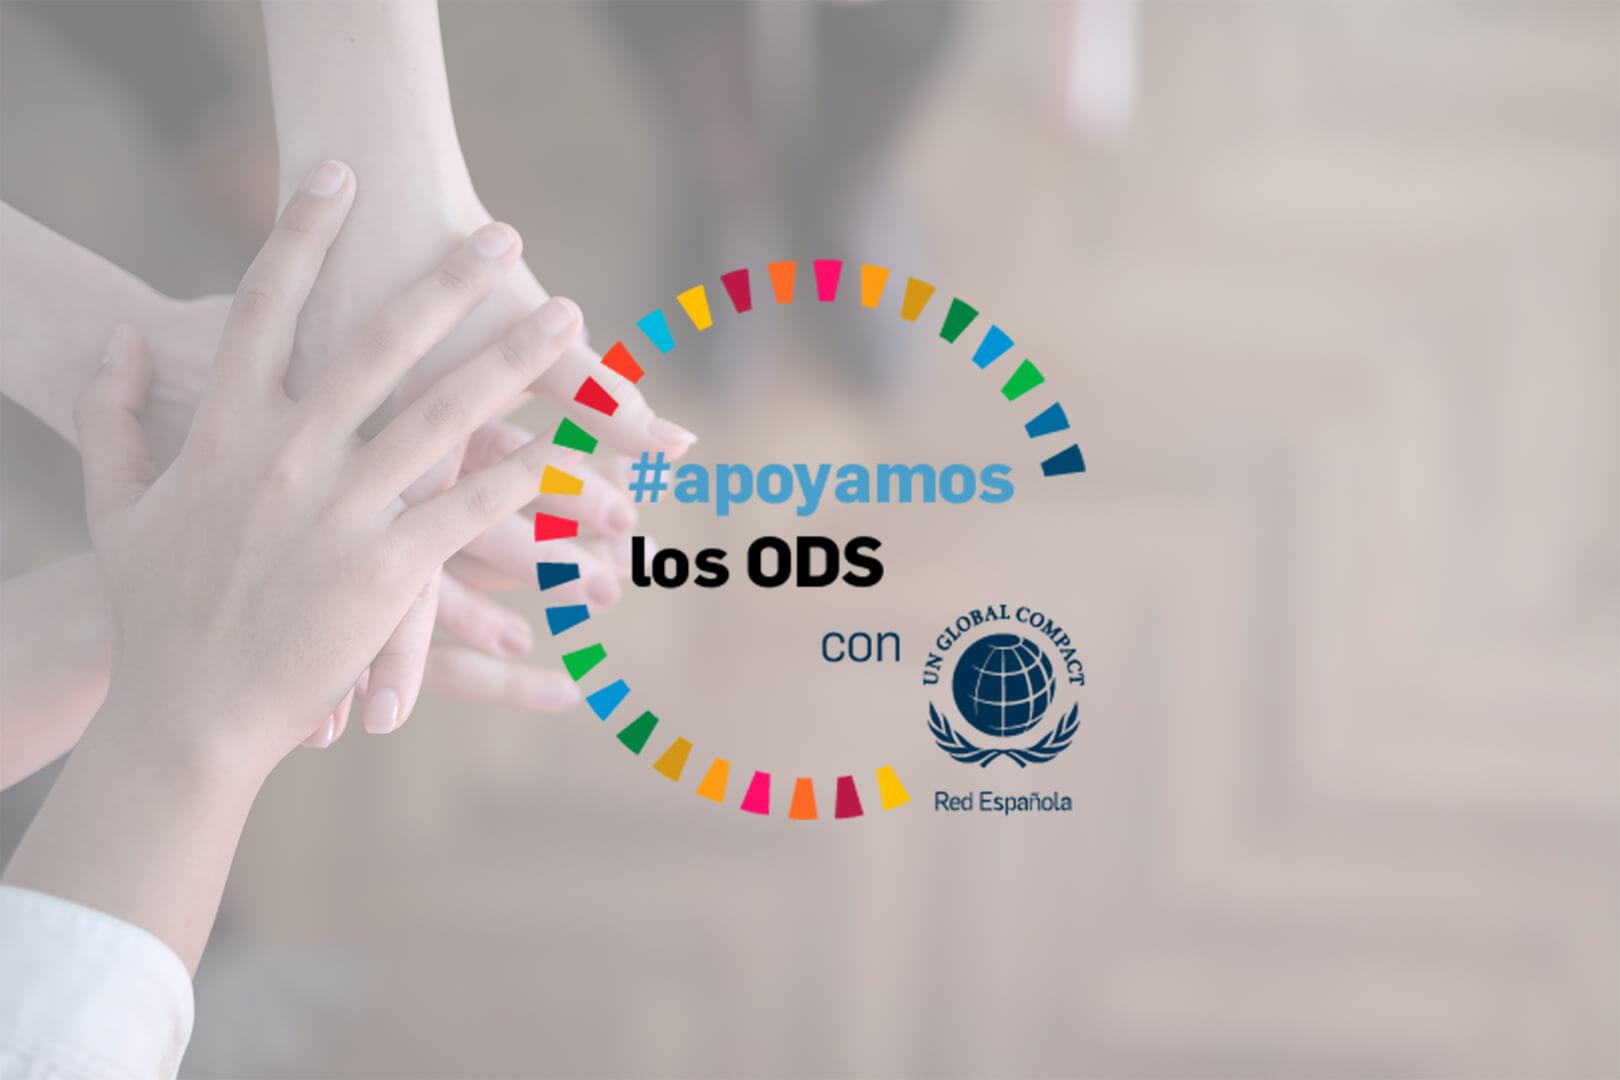 Campaña apoyamos los ods Grupo Innovaris 2021 3x2